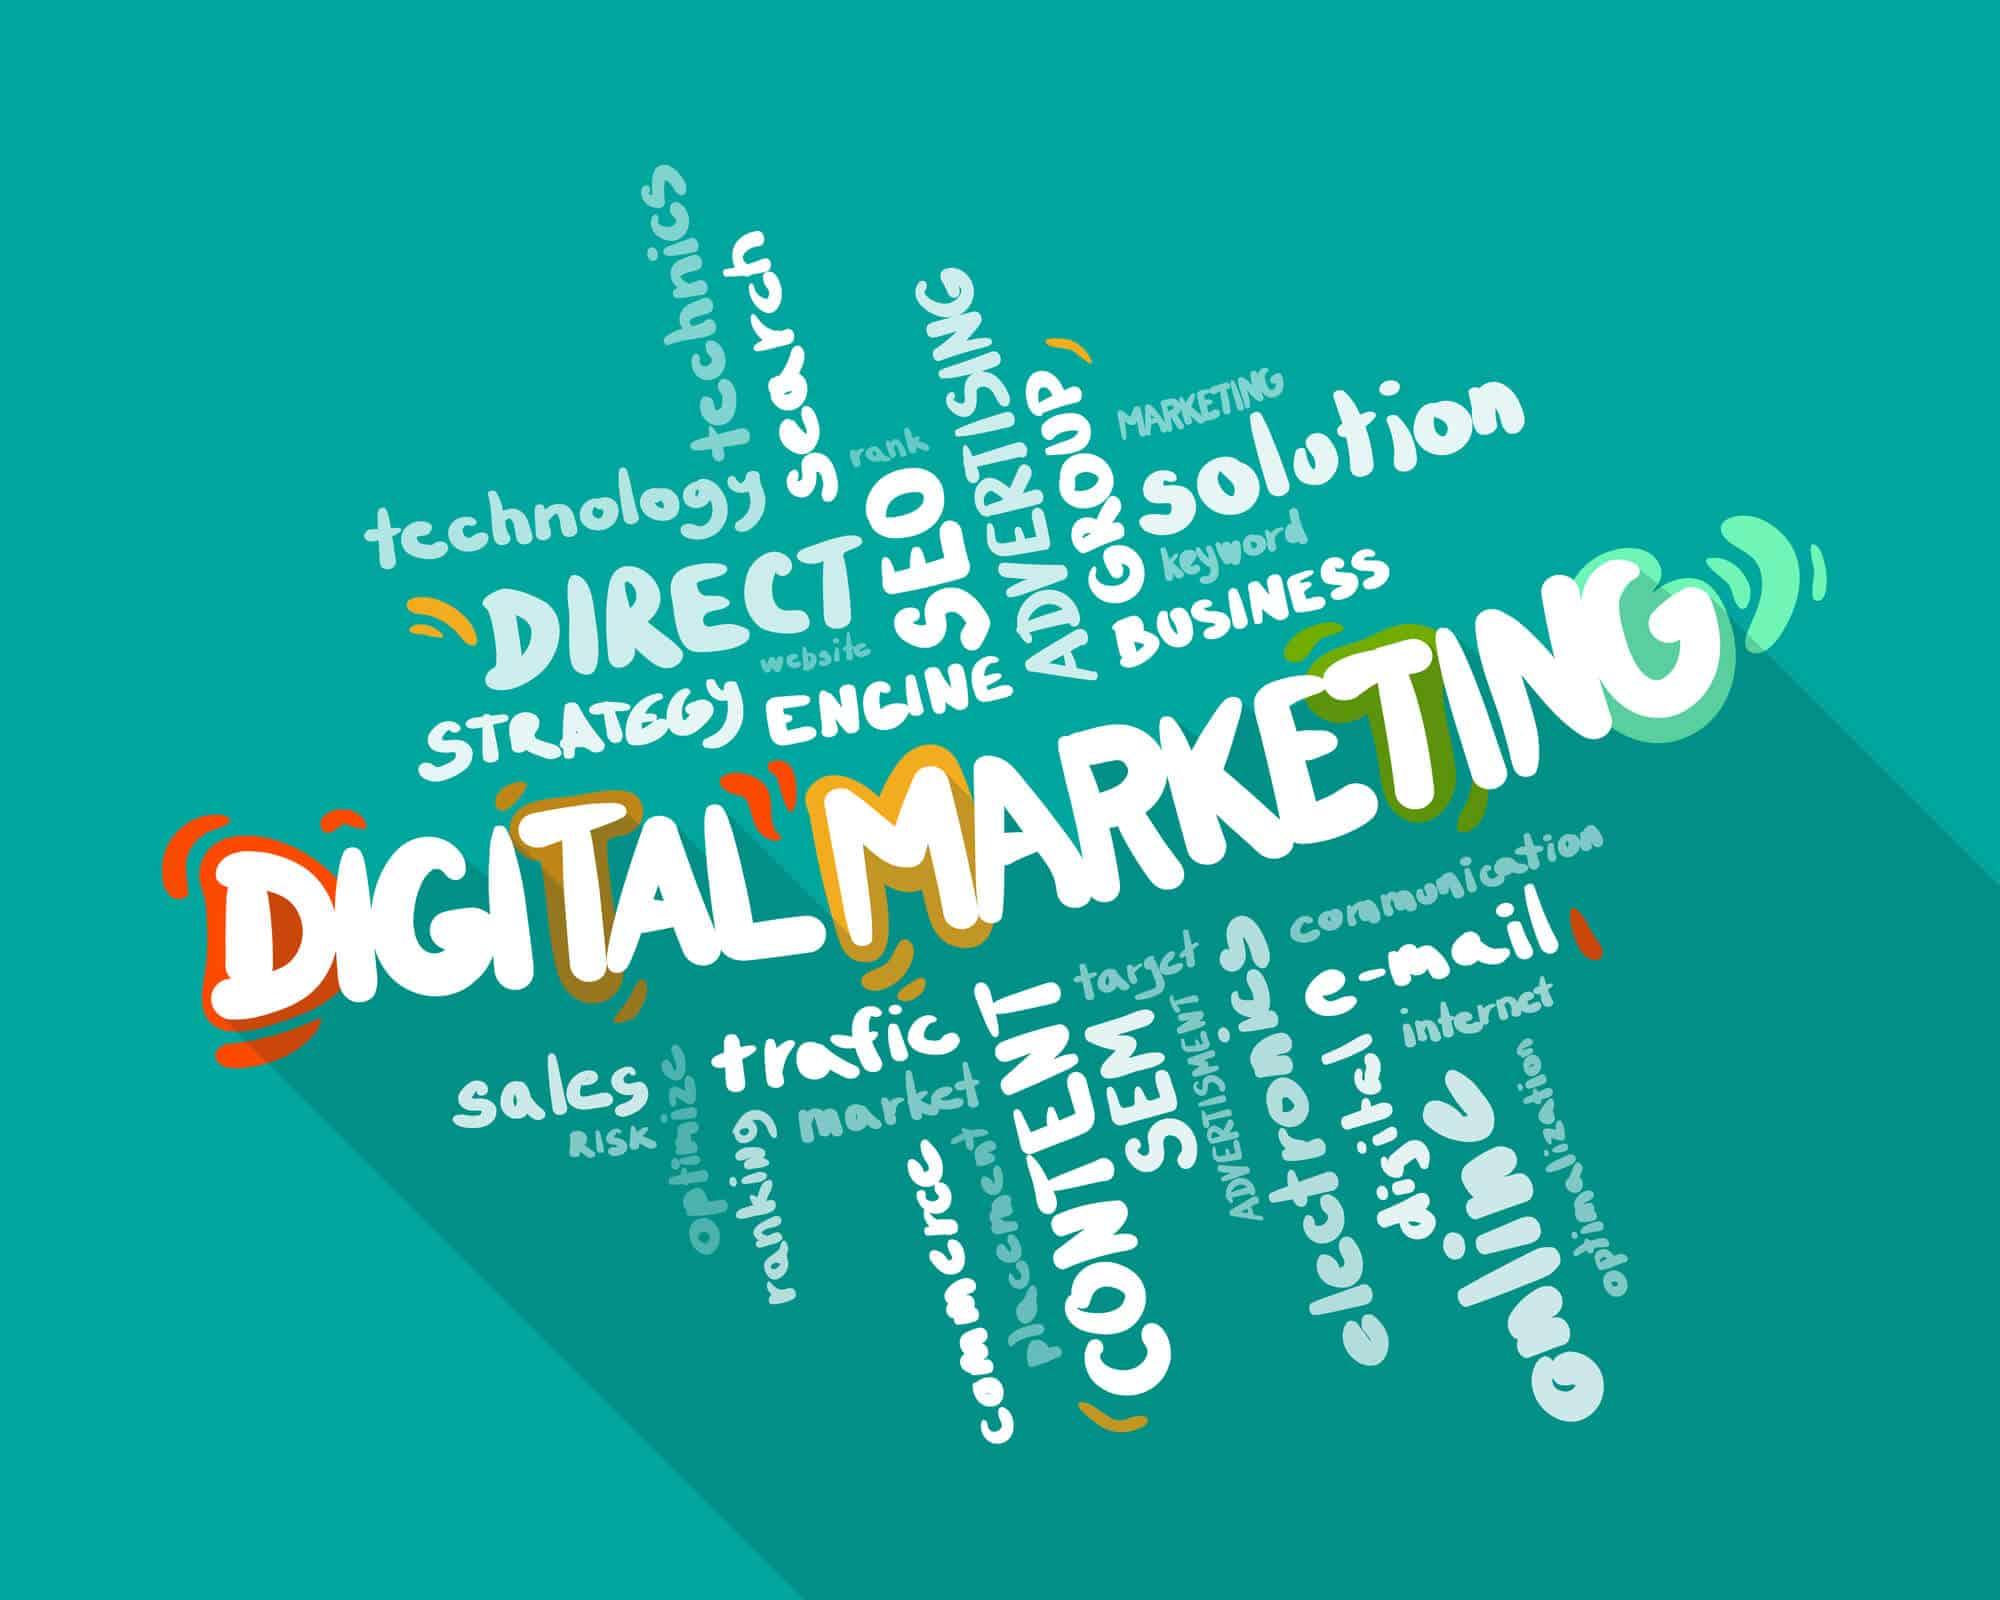 Web Design & Digital Marketing Agency in New Orleans